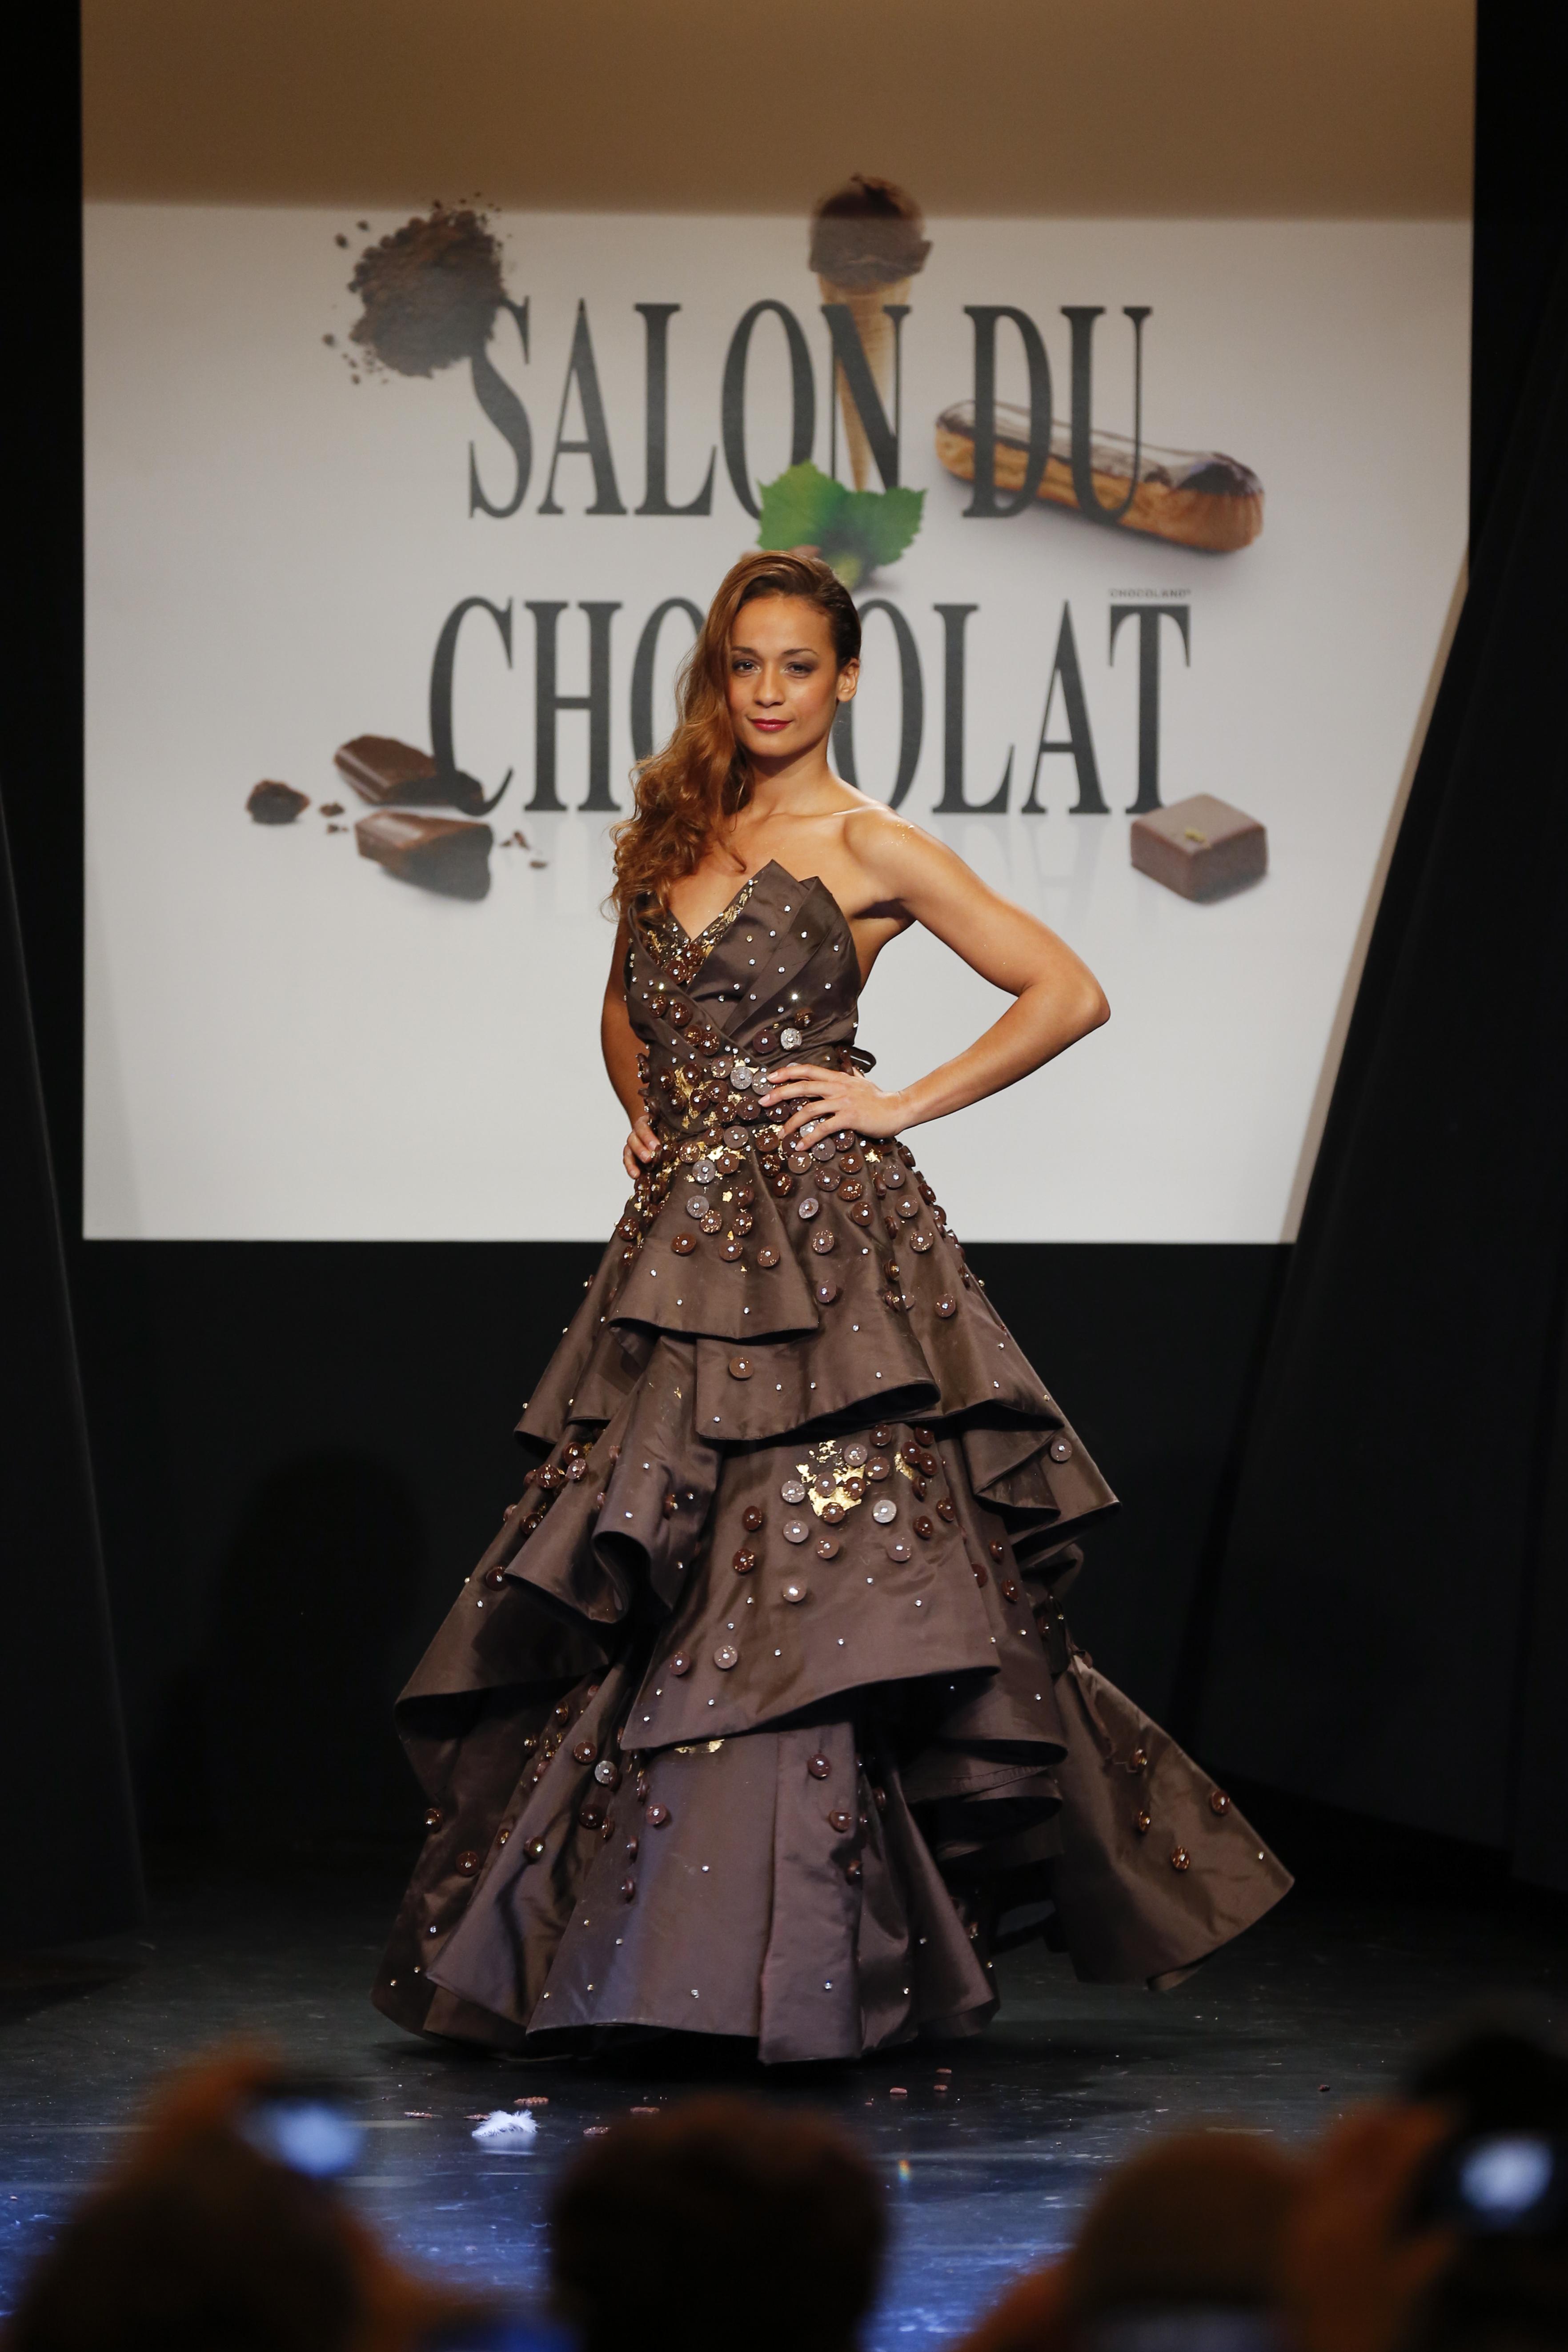 Salon du Chocolat (2).jpg